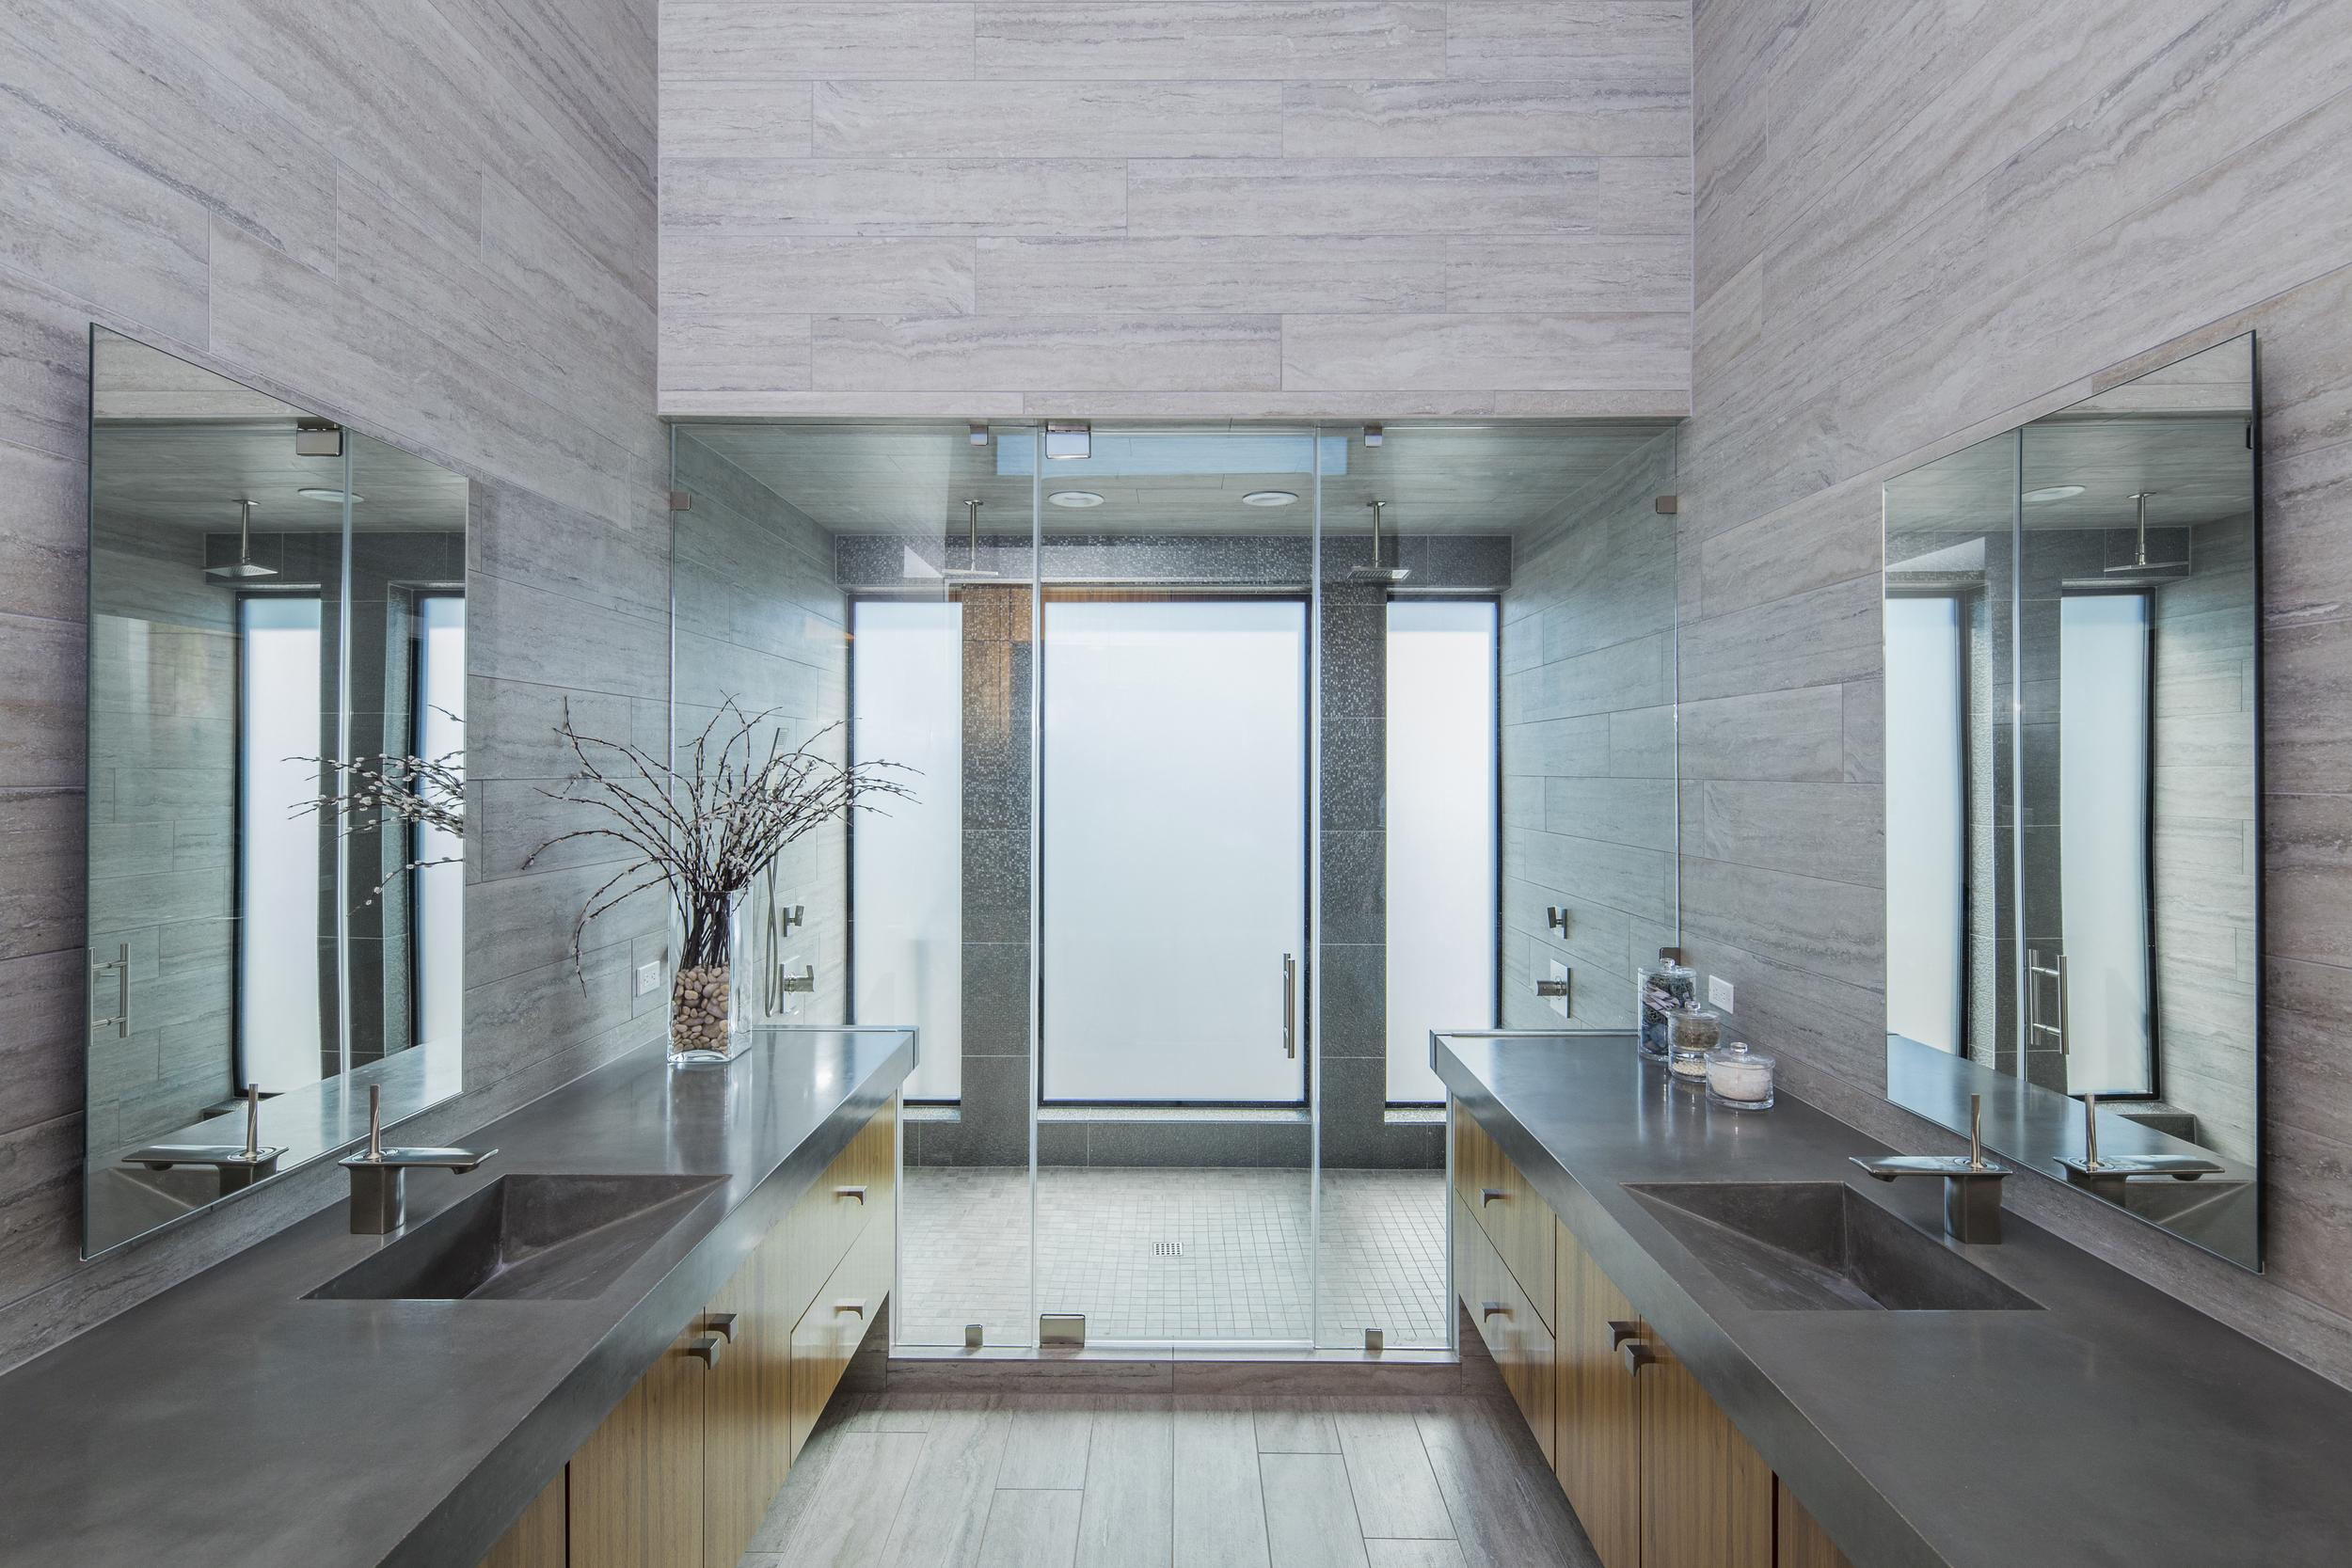 2015_0429 Matt Fajkus Architecture MF Cross Grain House 35.jpg